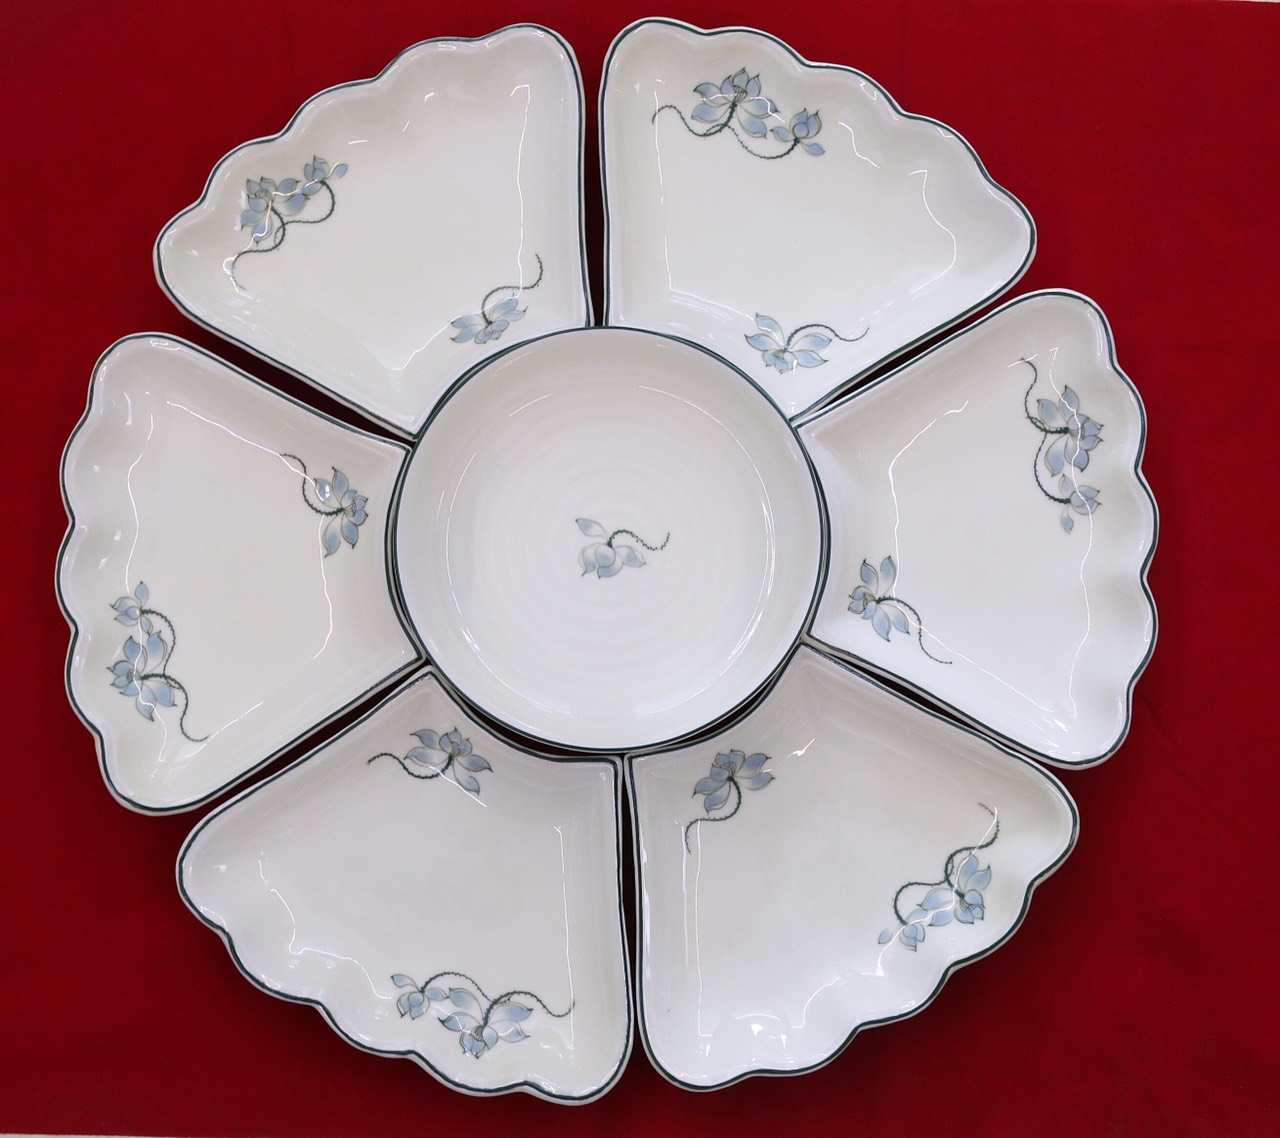 Bộ đĩa mặt trời hoa sen gốm sứ Bát Tràng